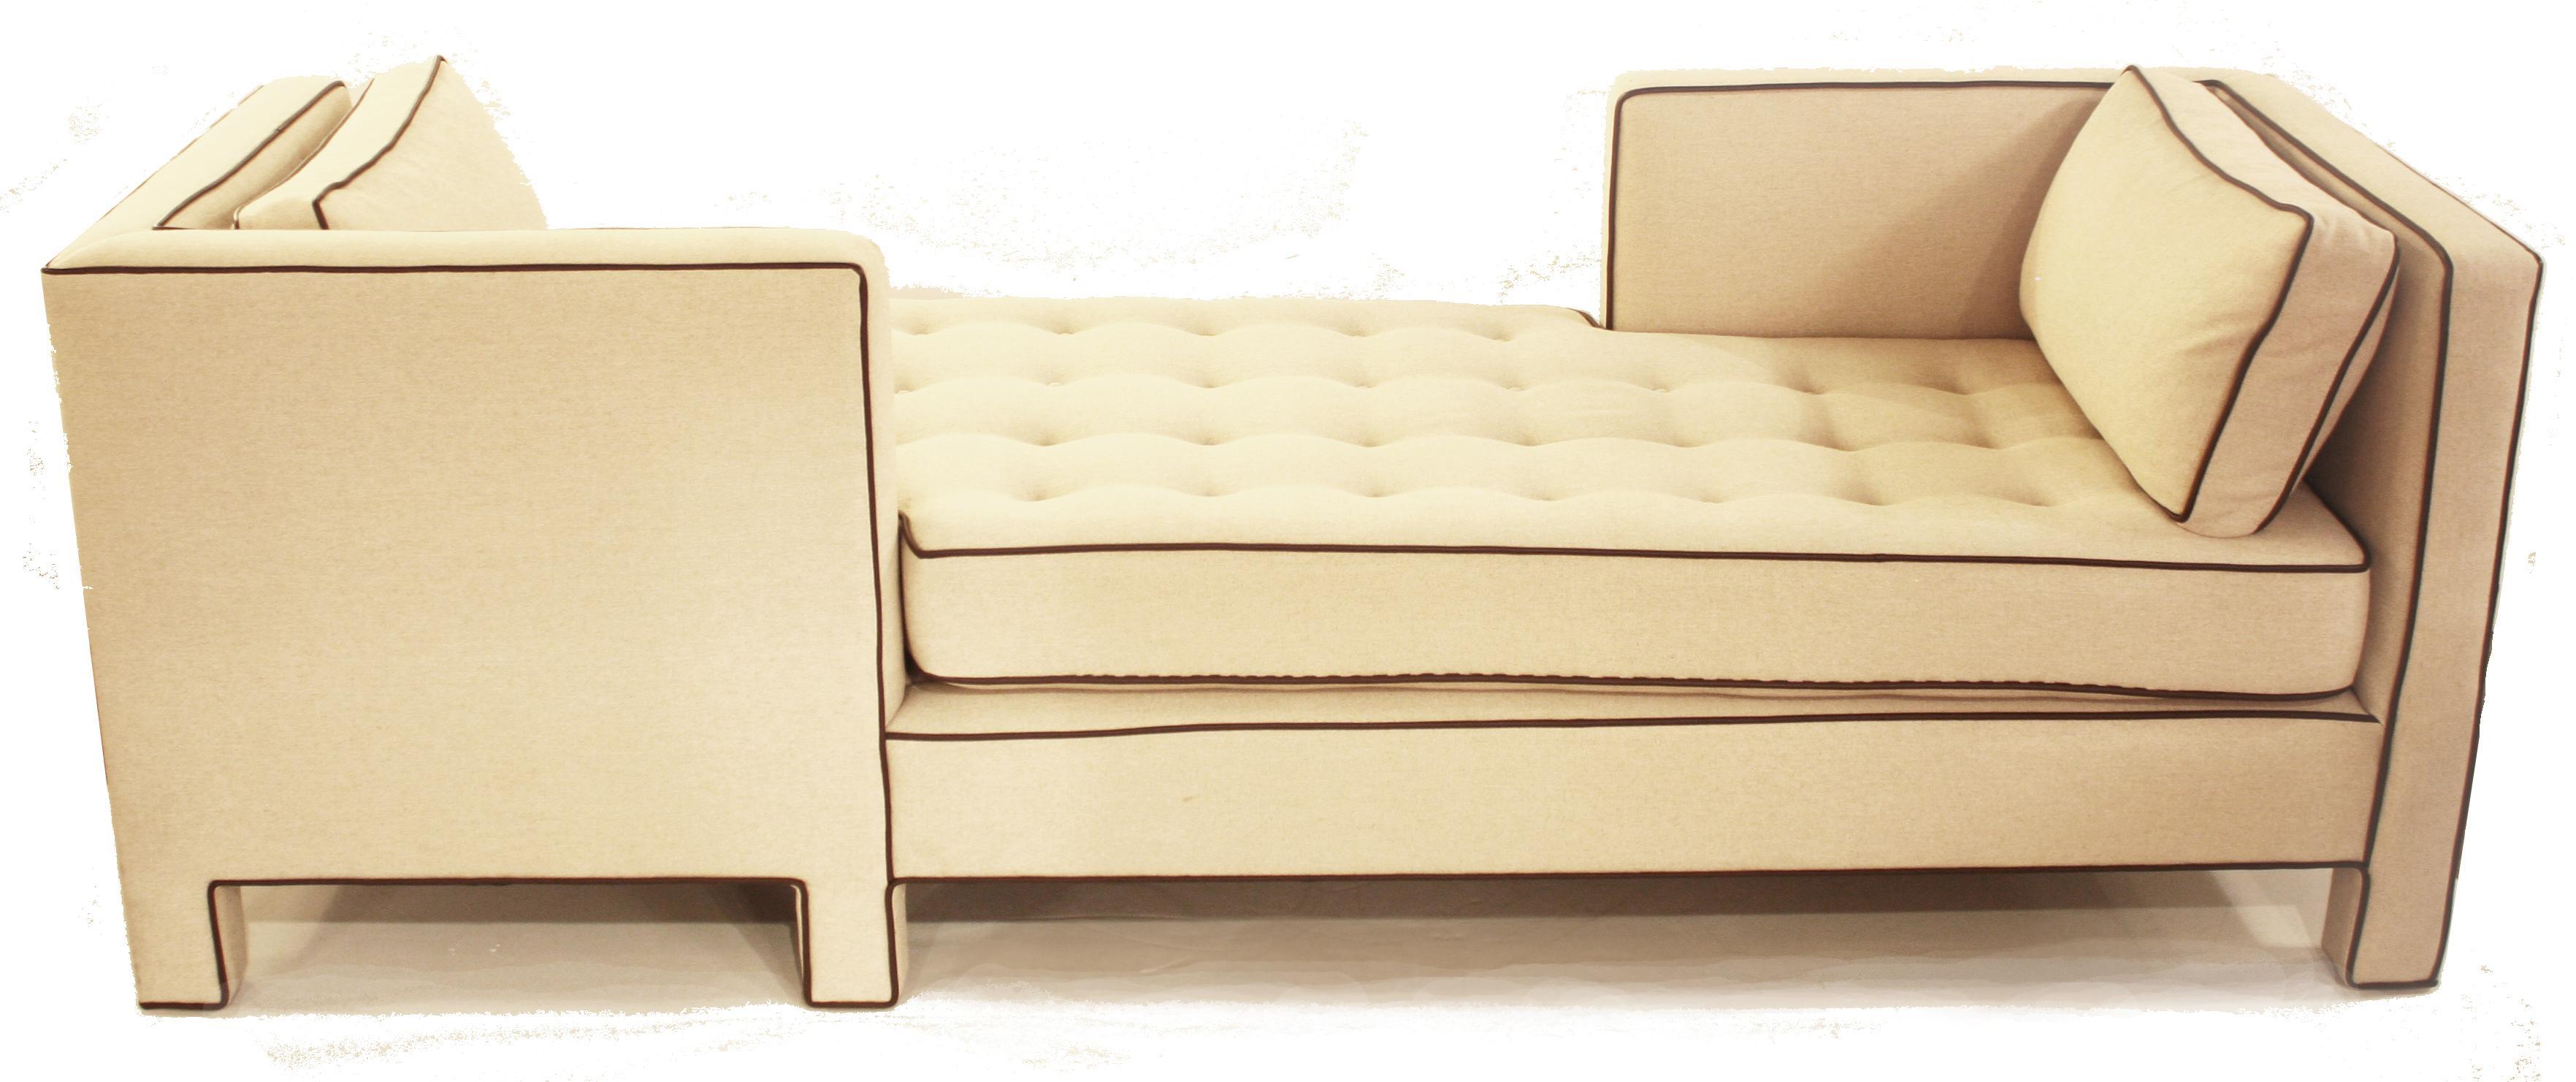 Dunbar Tete A Tete Sofa Attributed To Designer Edward Wormley   Image 3 Of